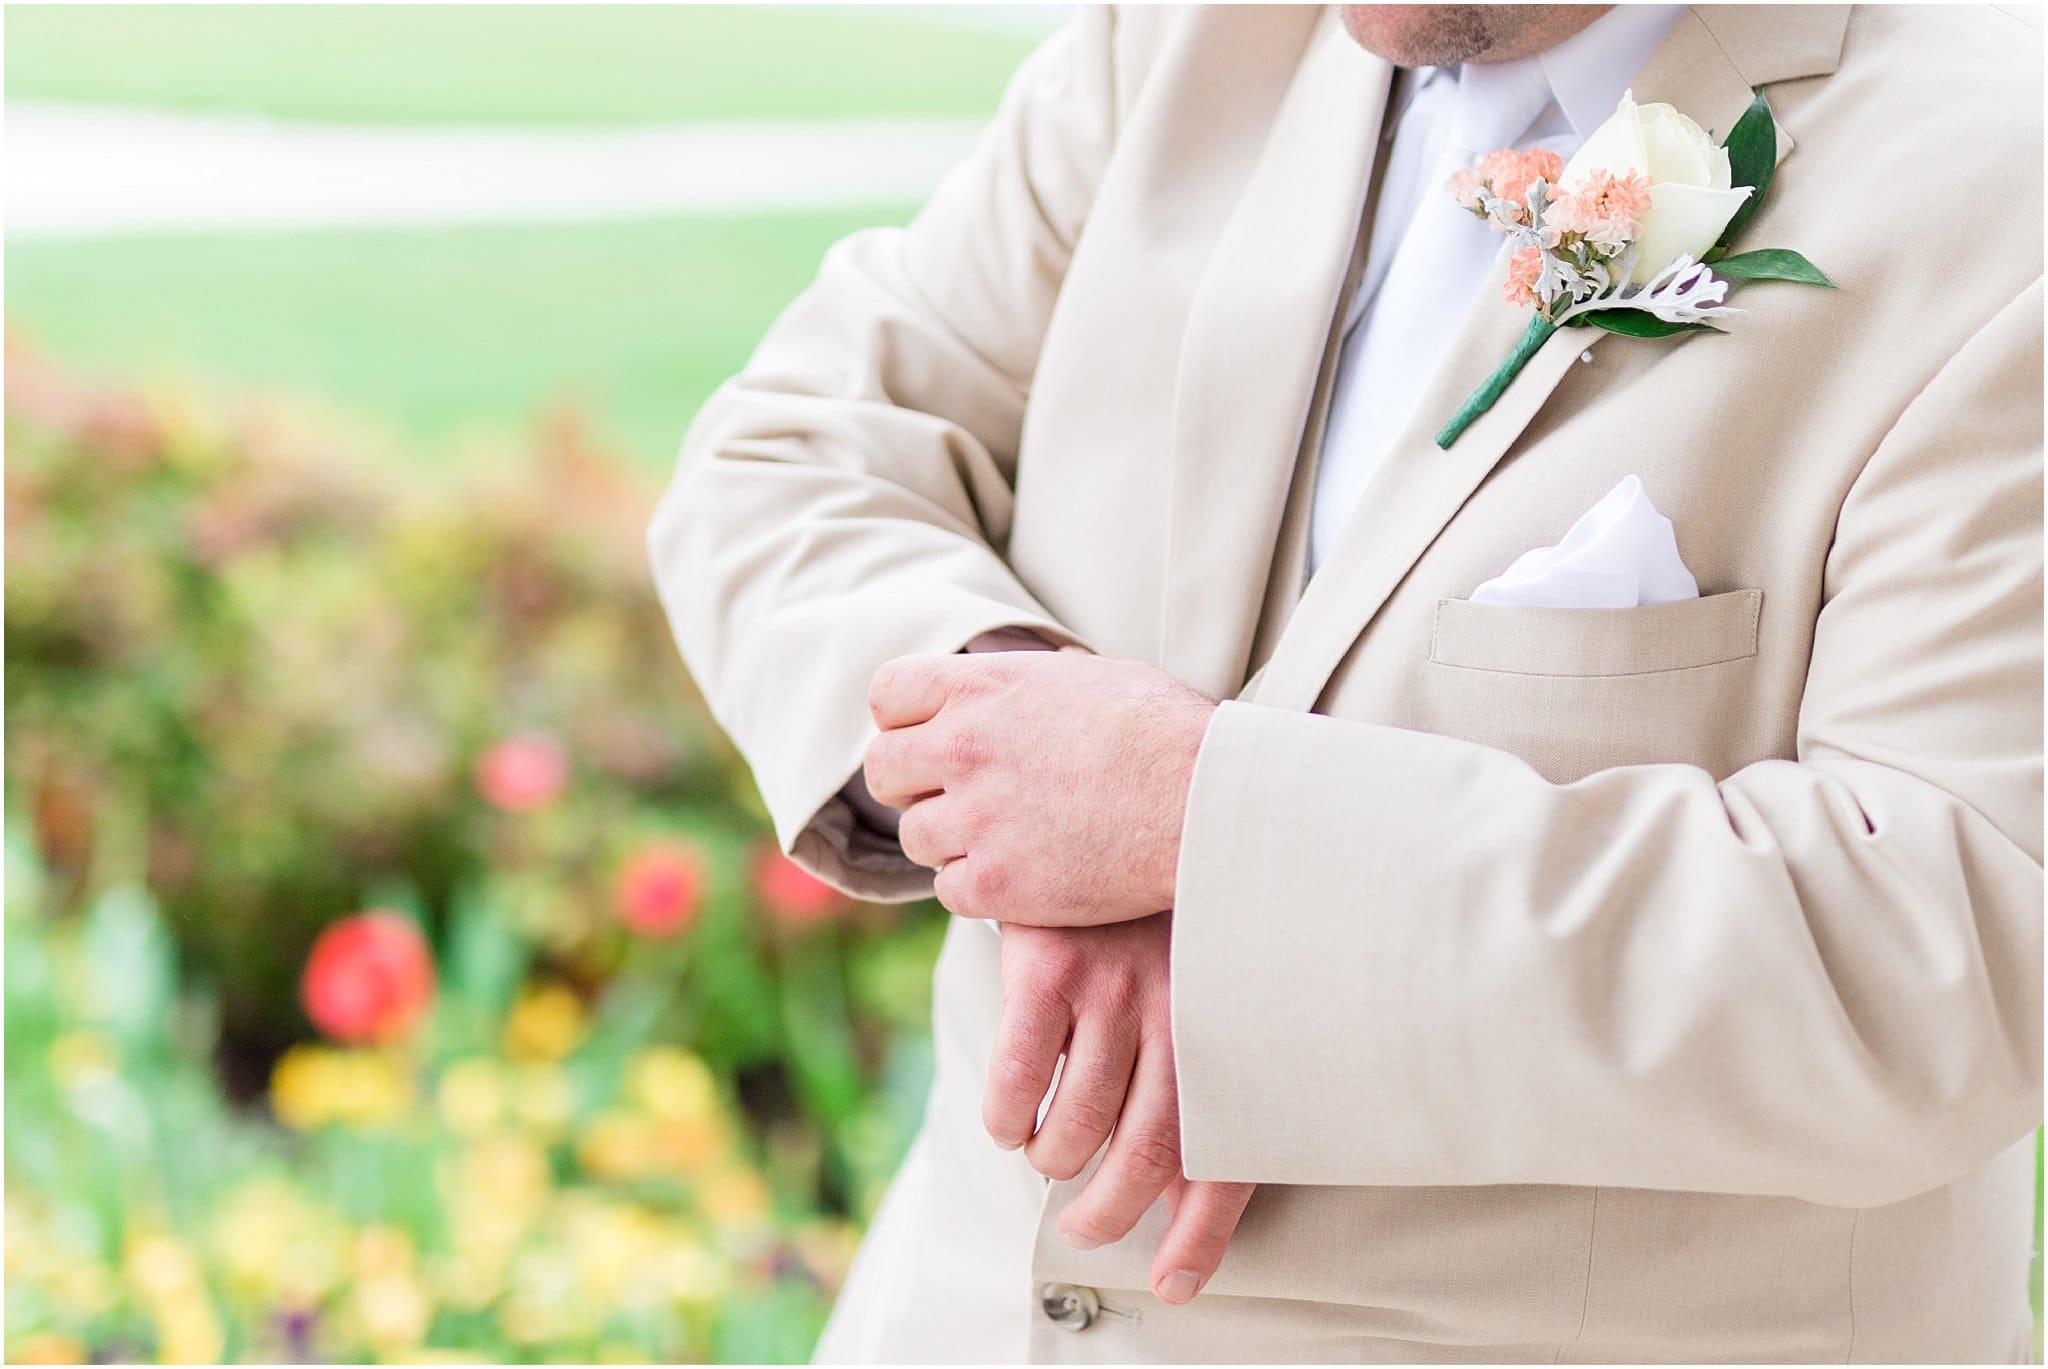 jessscott-milsboro-delaware-wedding-cassidymrphotography_0032